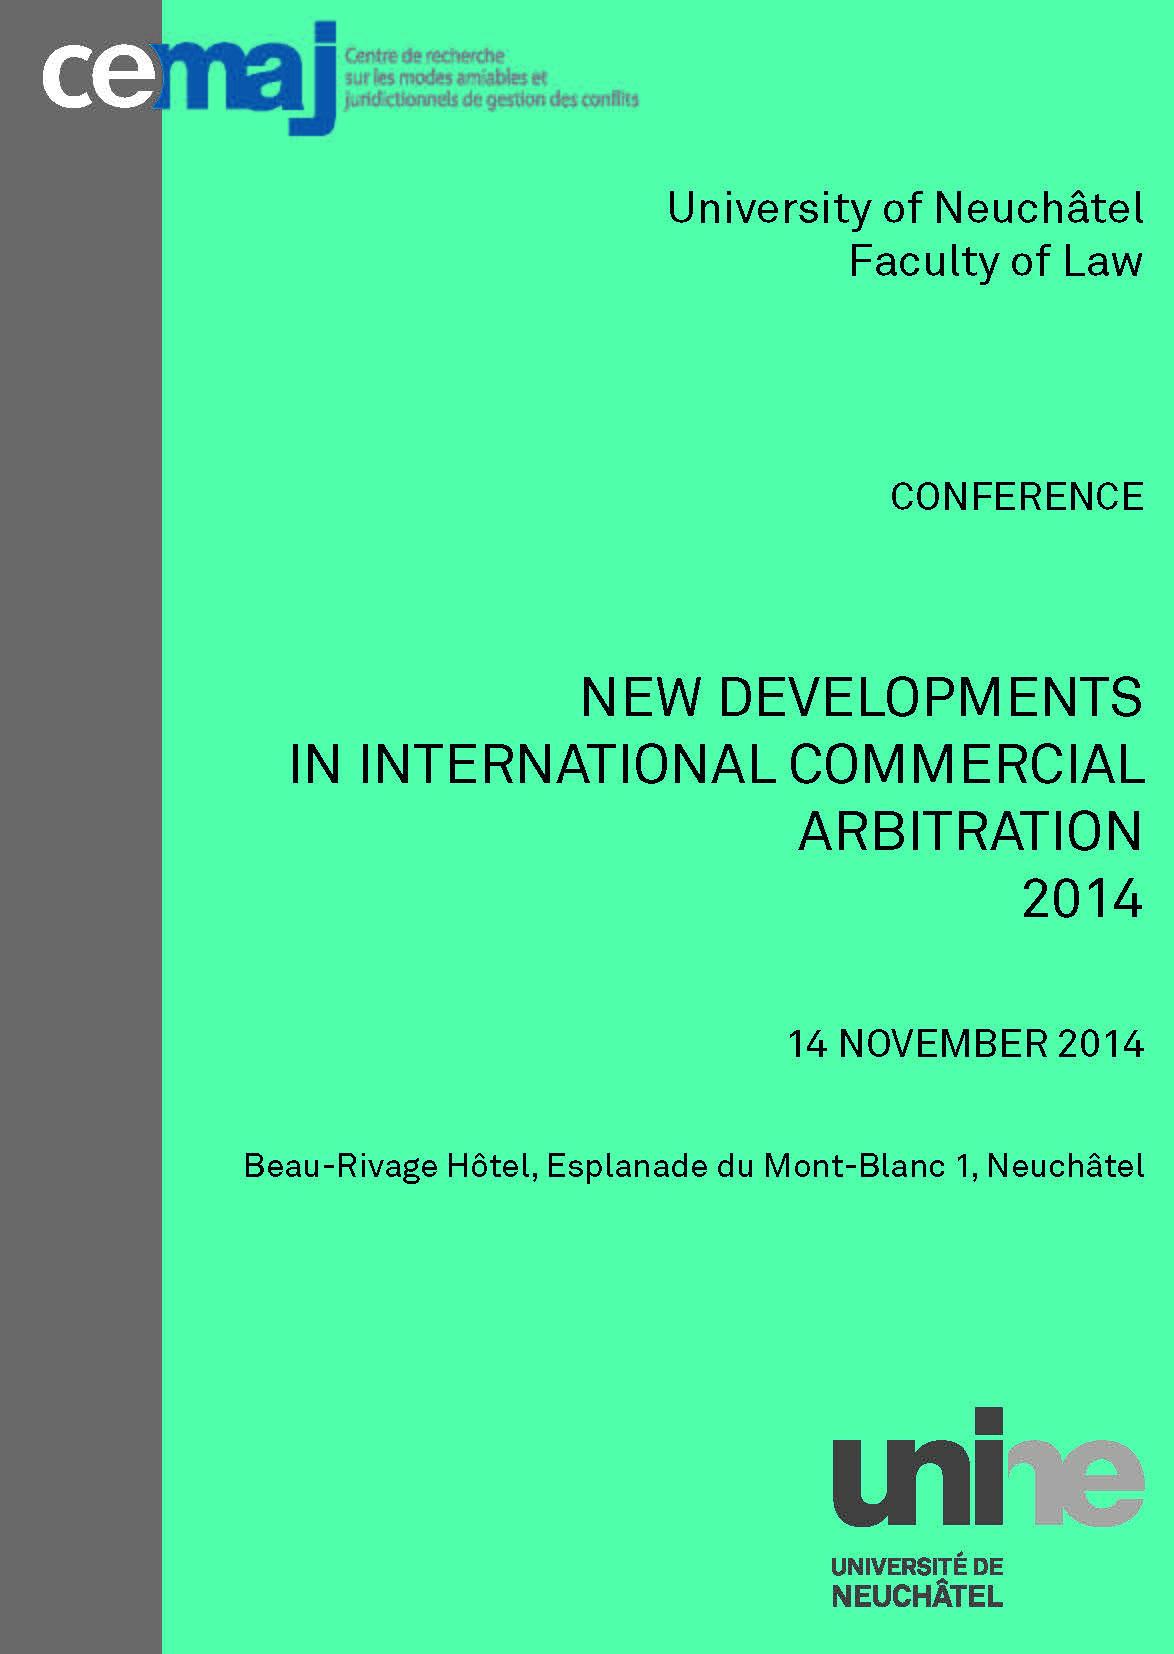 New Developments in International Commercial Arbitration 2014